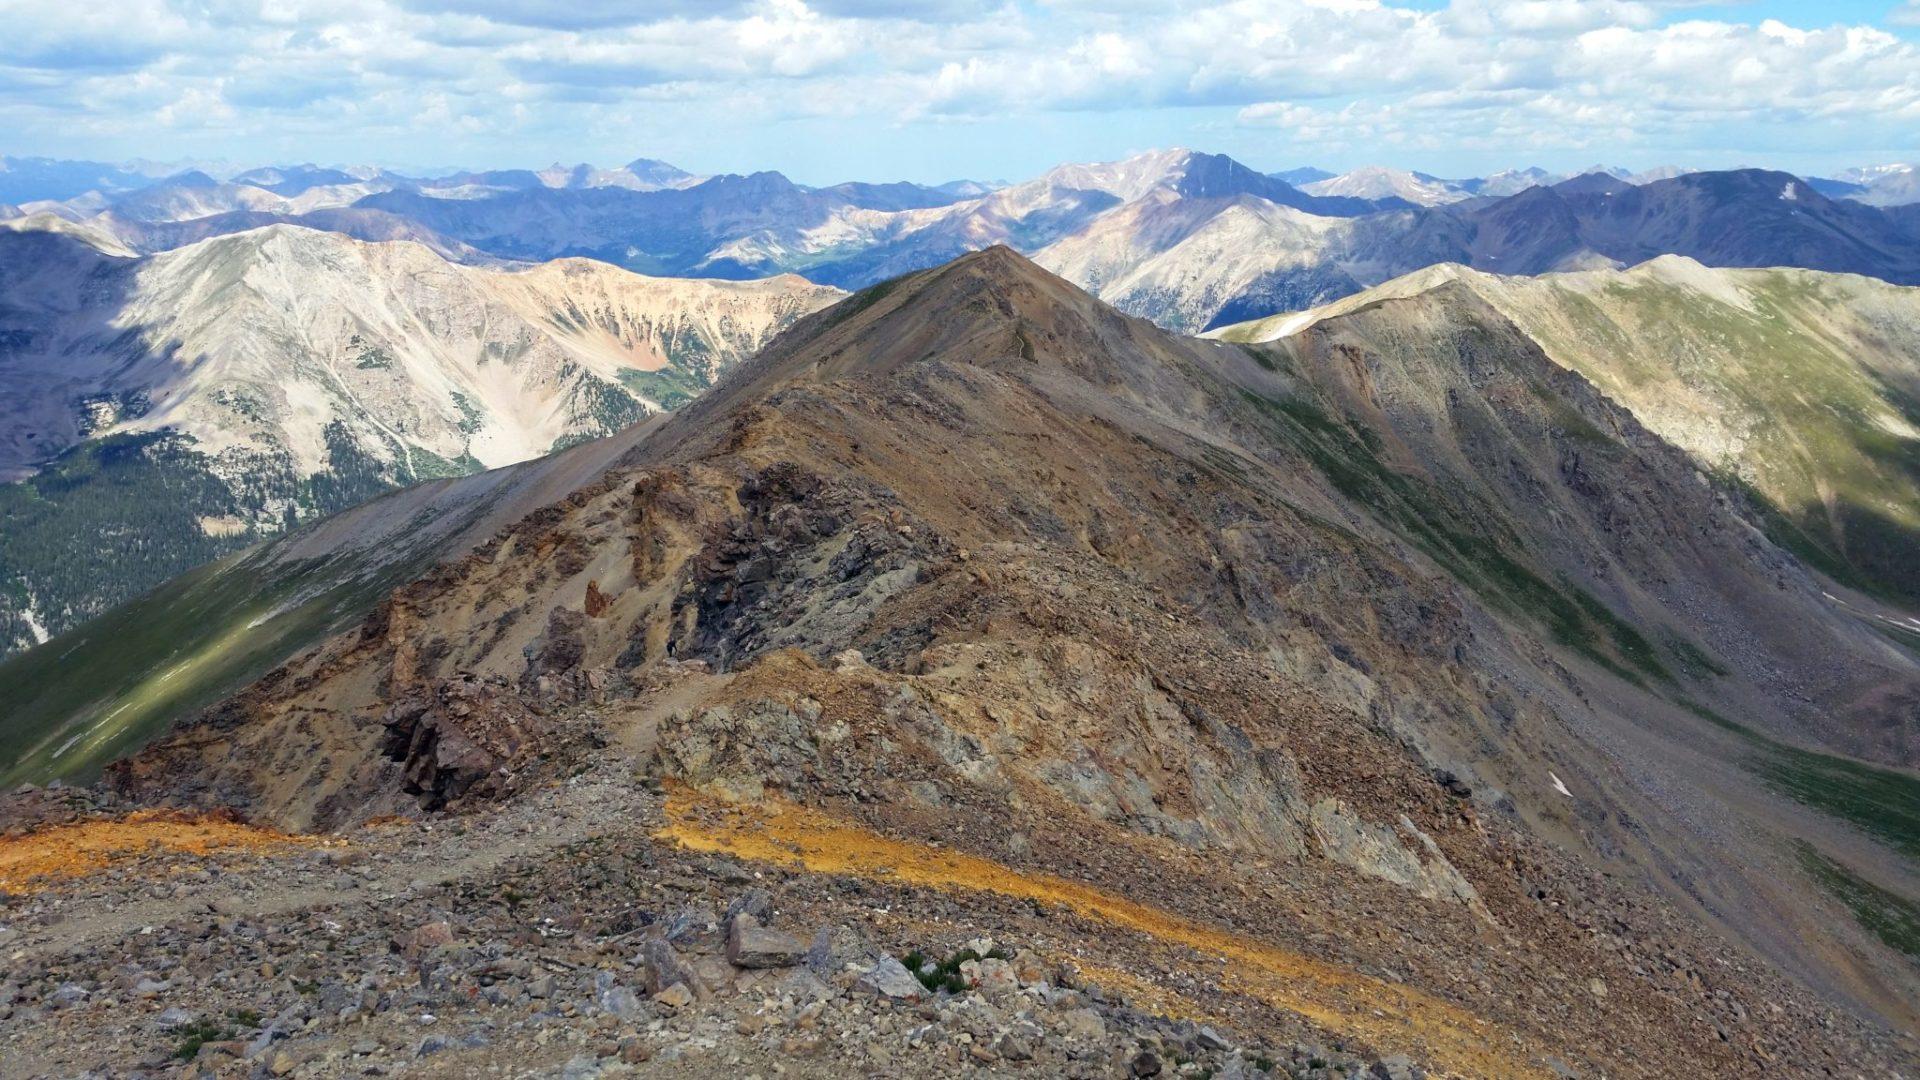 Missouri Mountain summit view